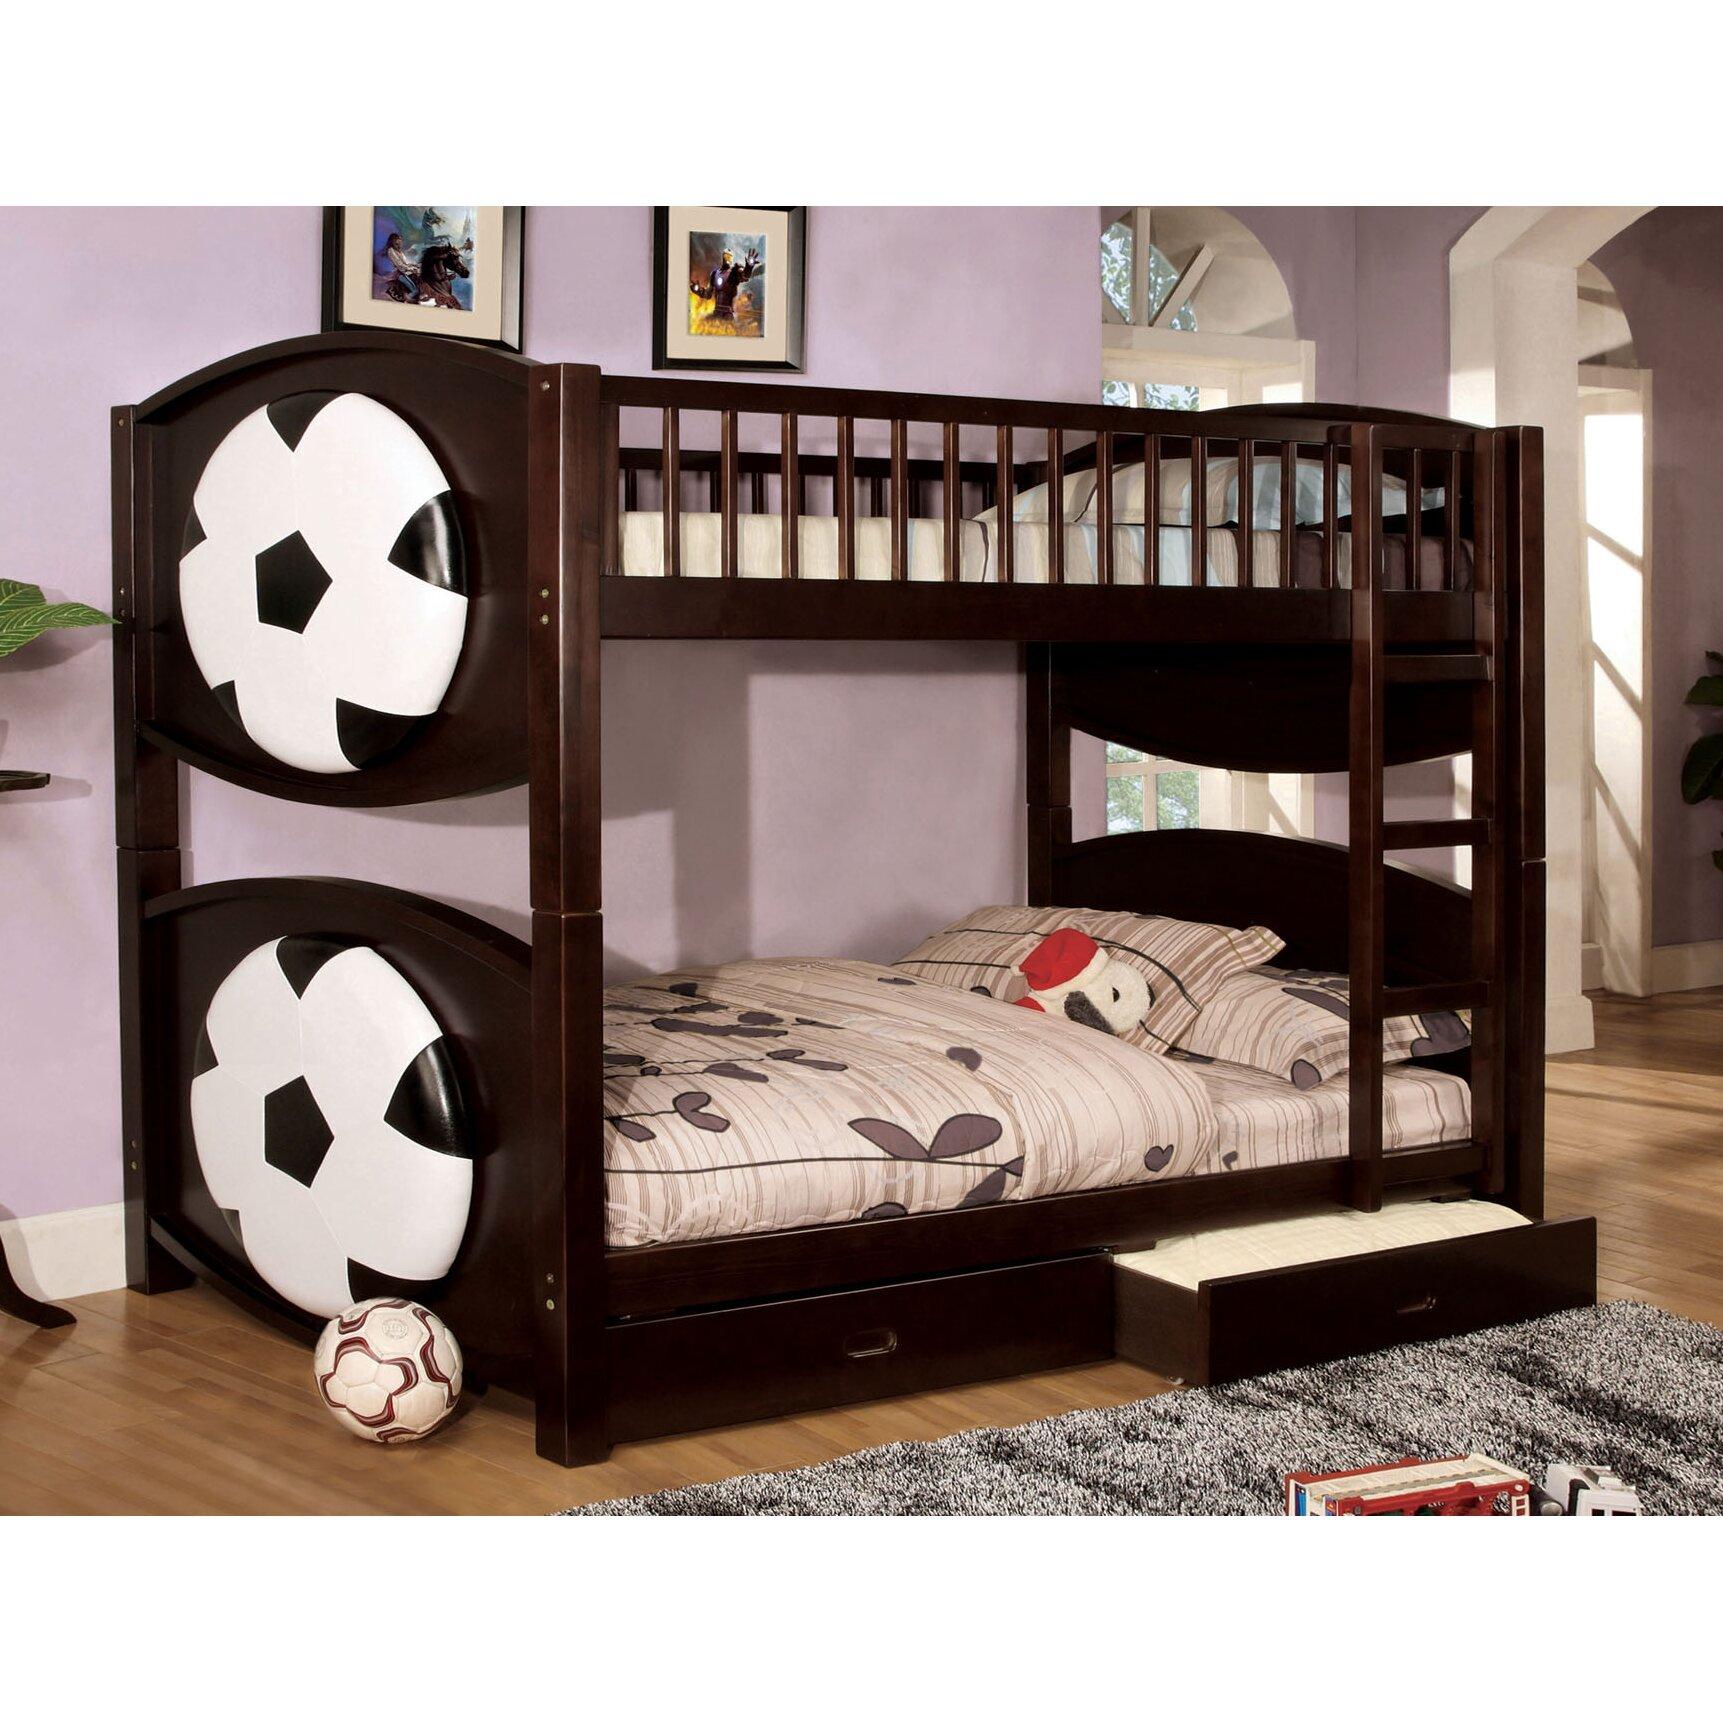 zoomie kids aiden twin bunk bed with storage wayfair. Black Bedroom Furniture Sets. Home Design Ideas